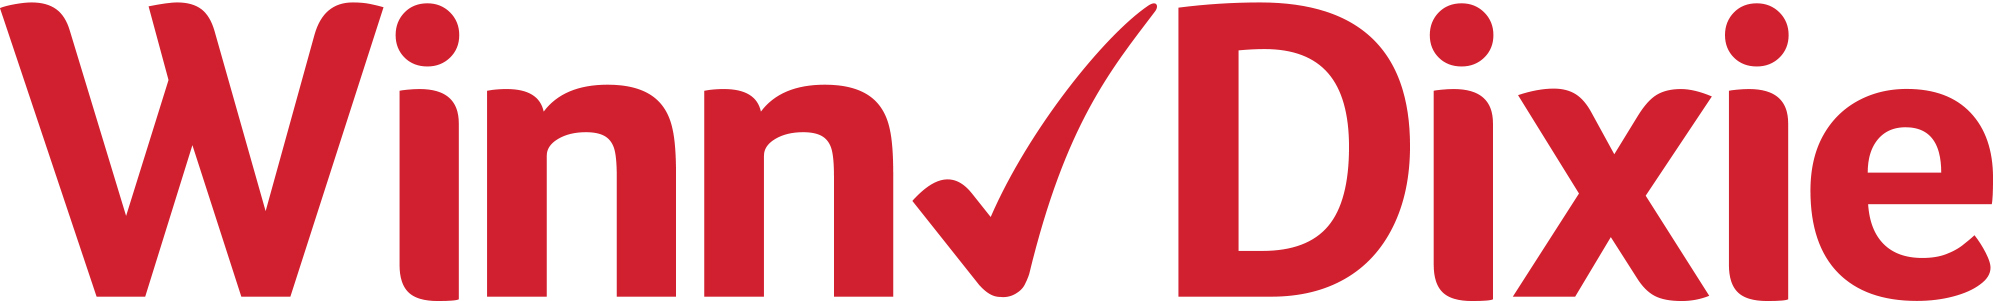 WinnDixie_Logo_Red_CMYK_1553281585770